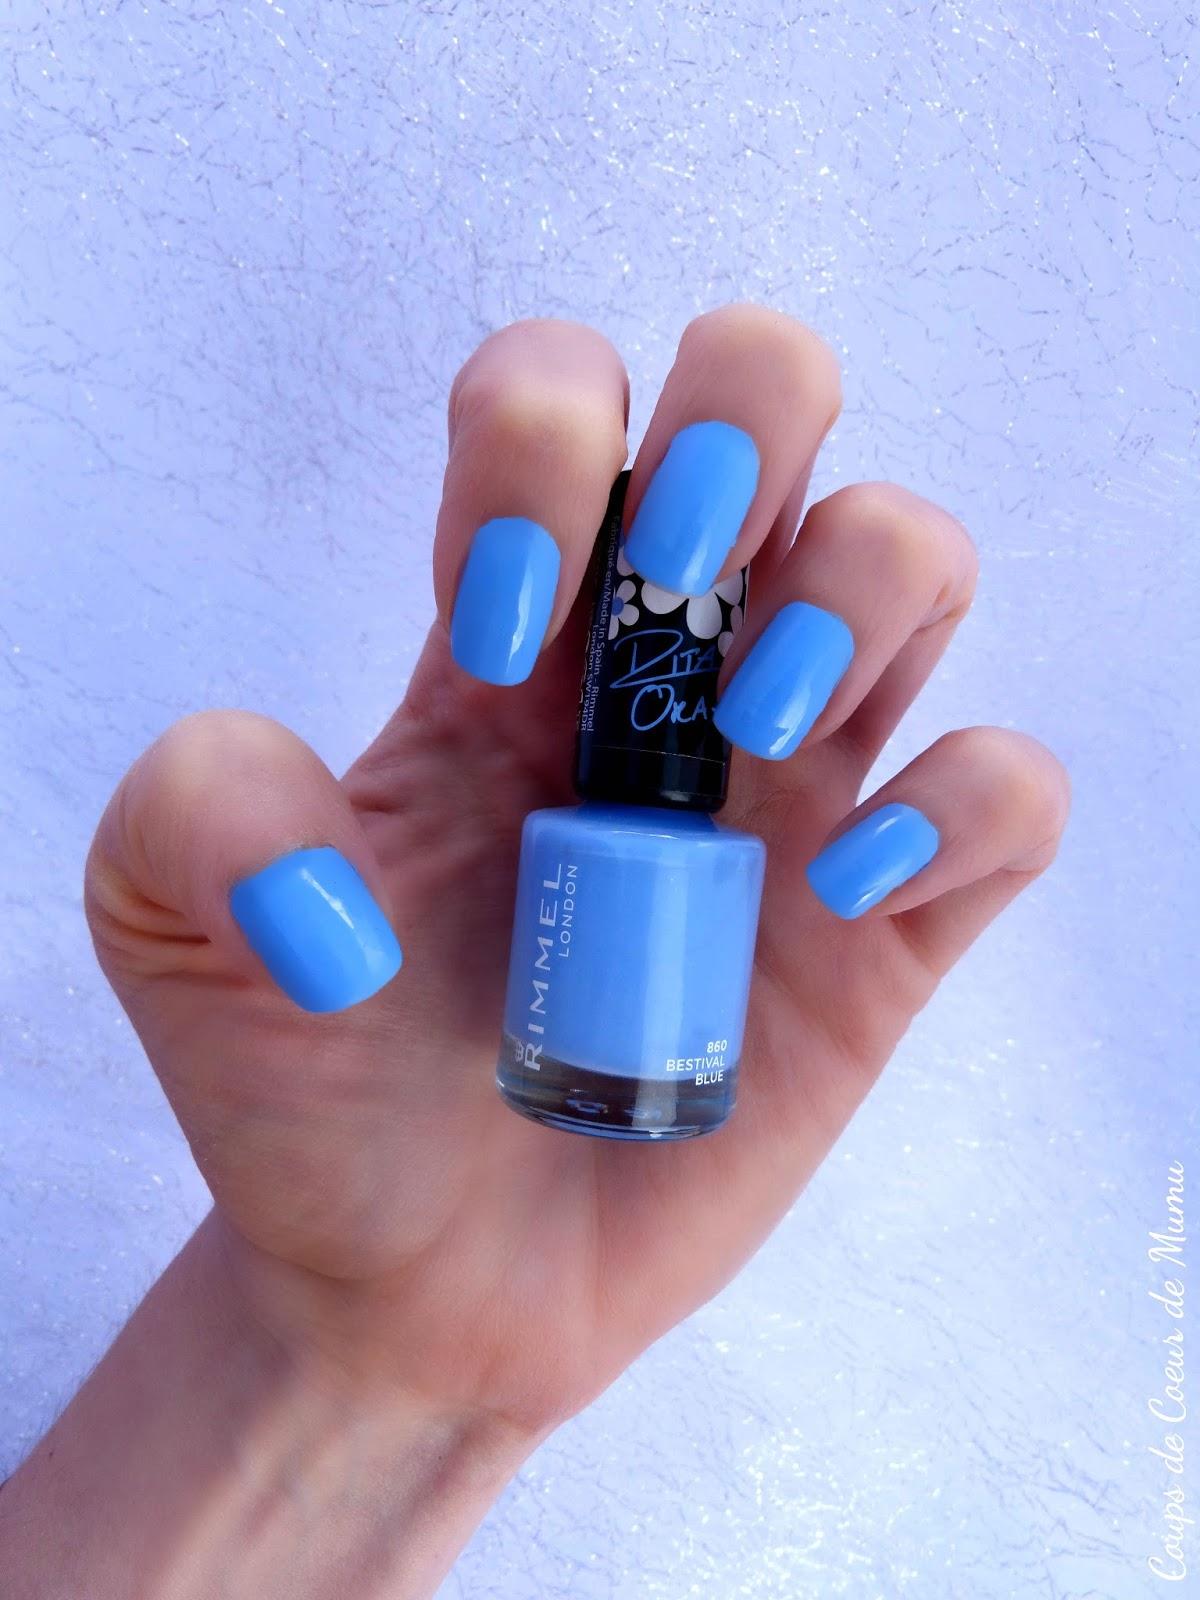 le vernis ongles bleu bestival blue rita ora de rimmel coups de coeur de mumu. Black Bedroom Furniture Sets. Home Design Ideas